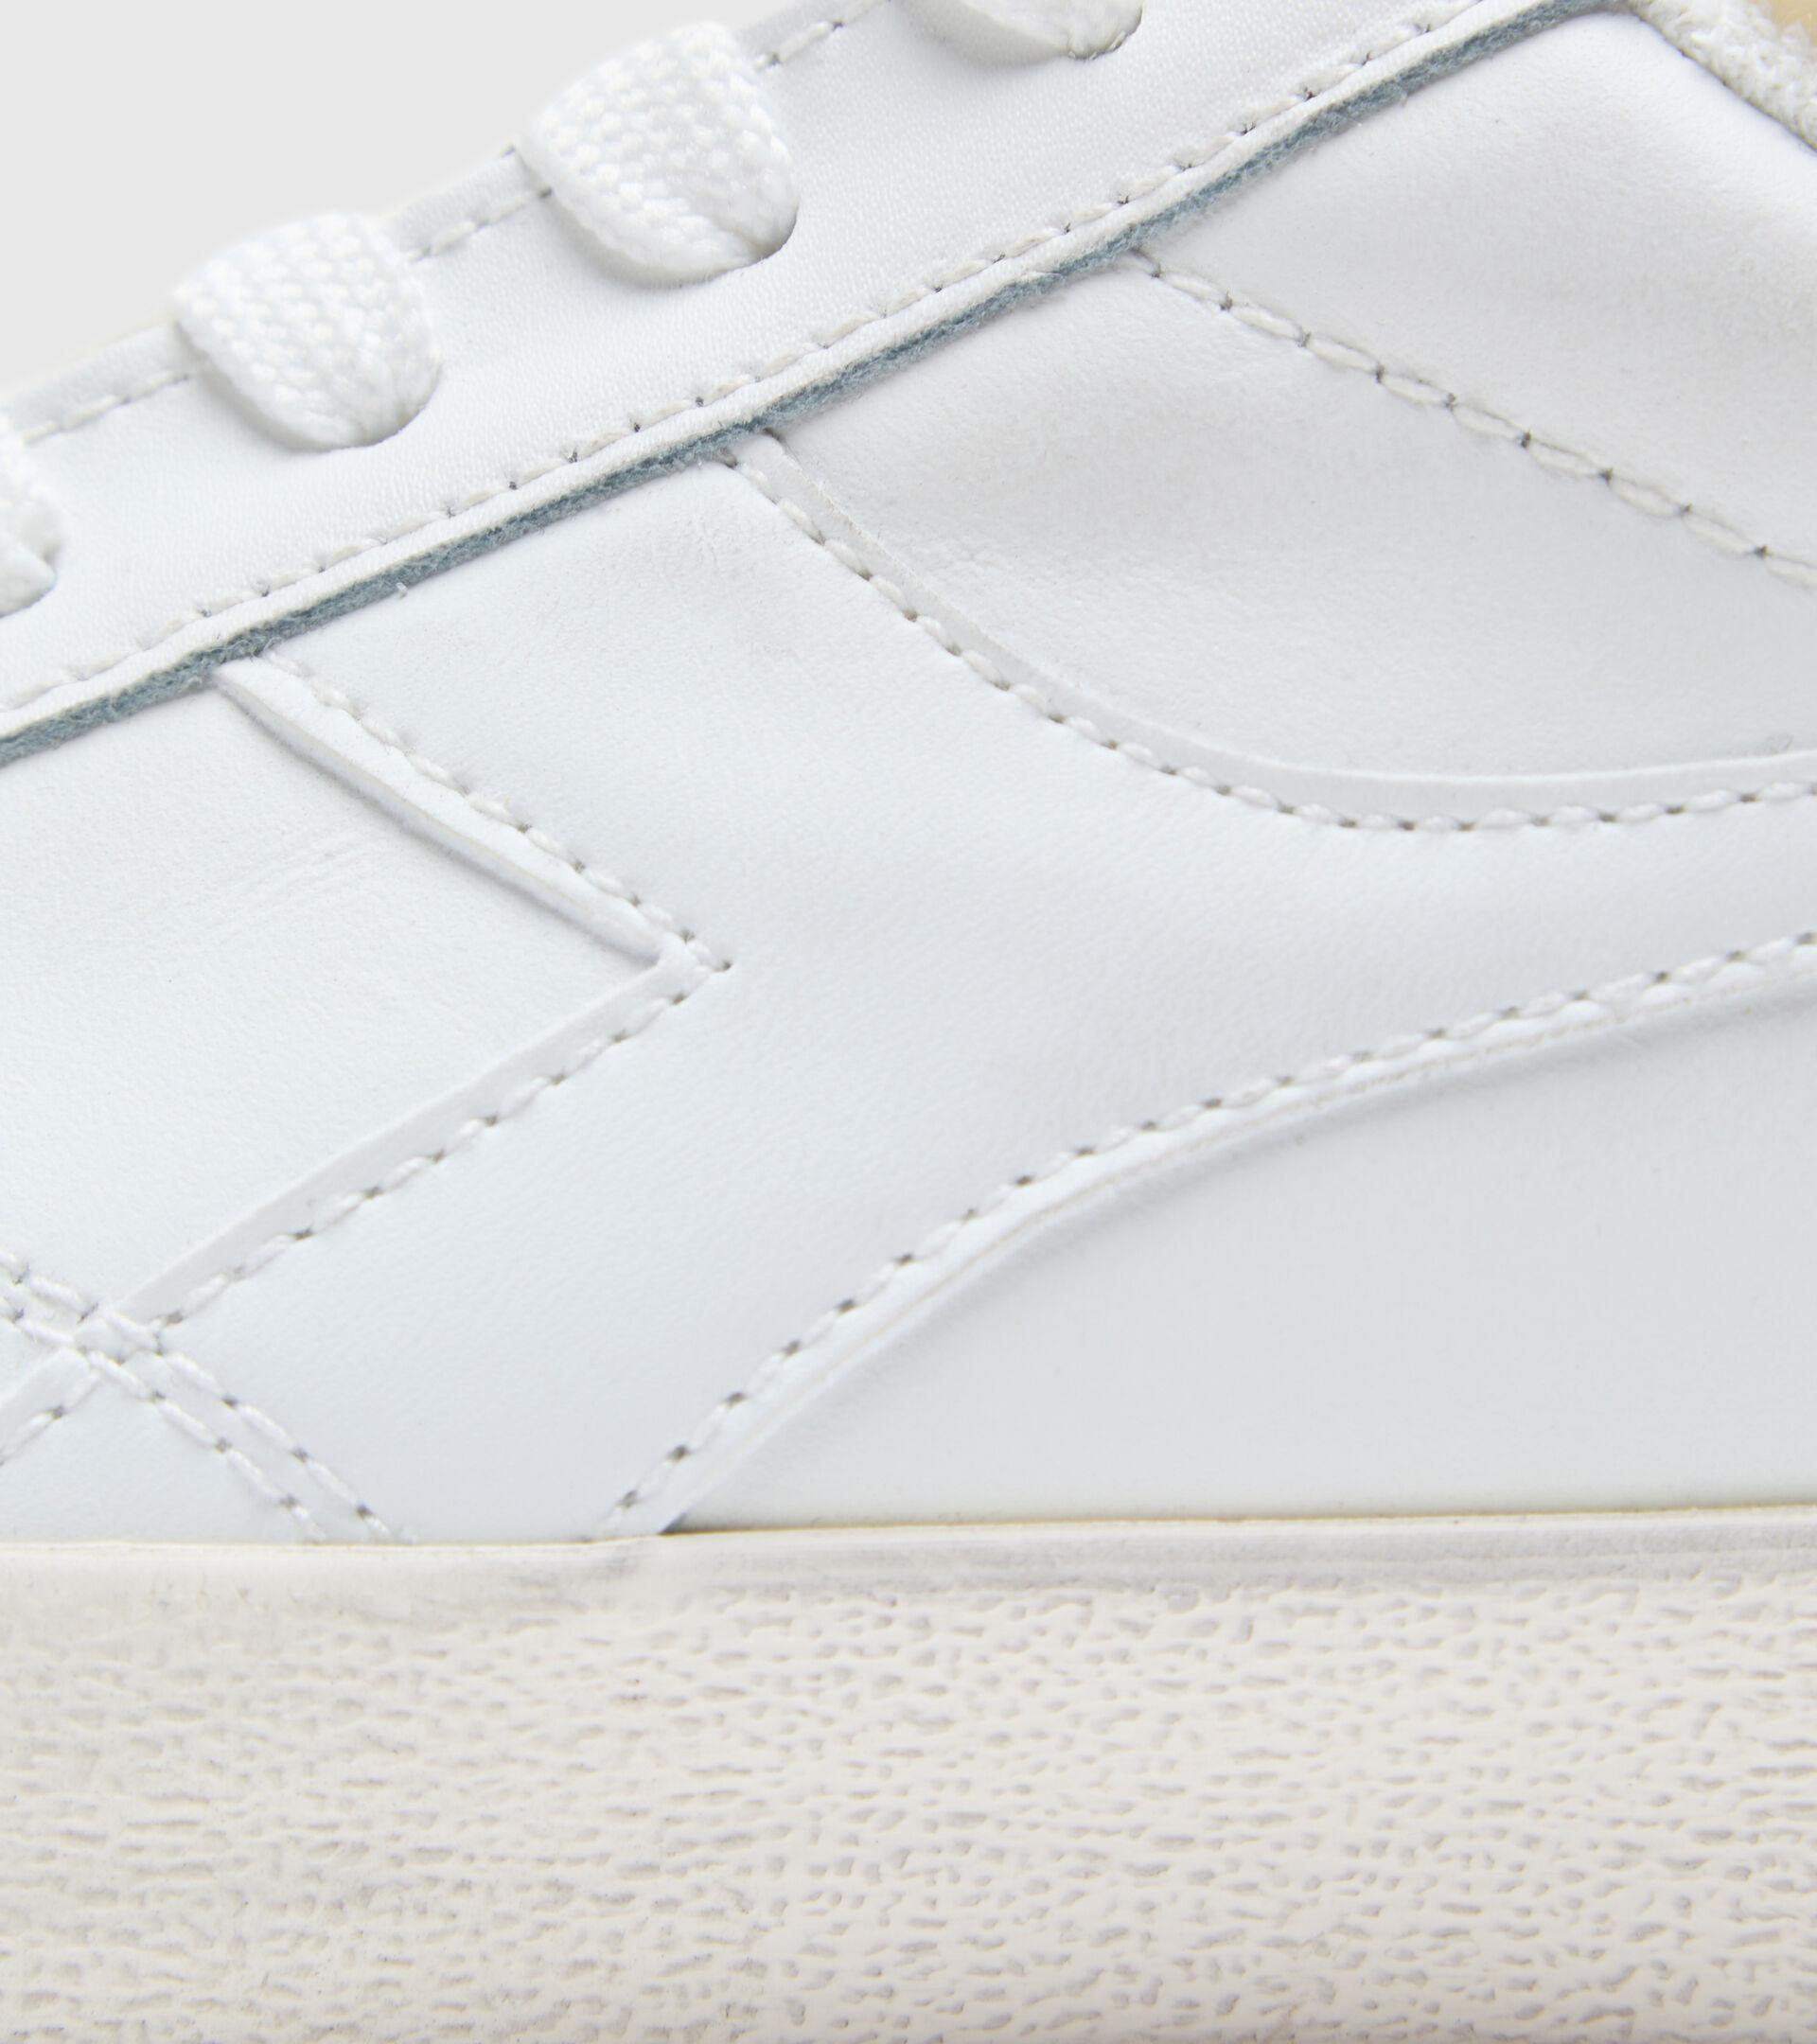 Zapatilla deportiva - Unisex MELODY LEATHER DIRTY BLANCO/NEGRO IRIS - Diadora